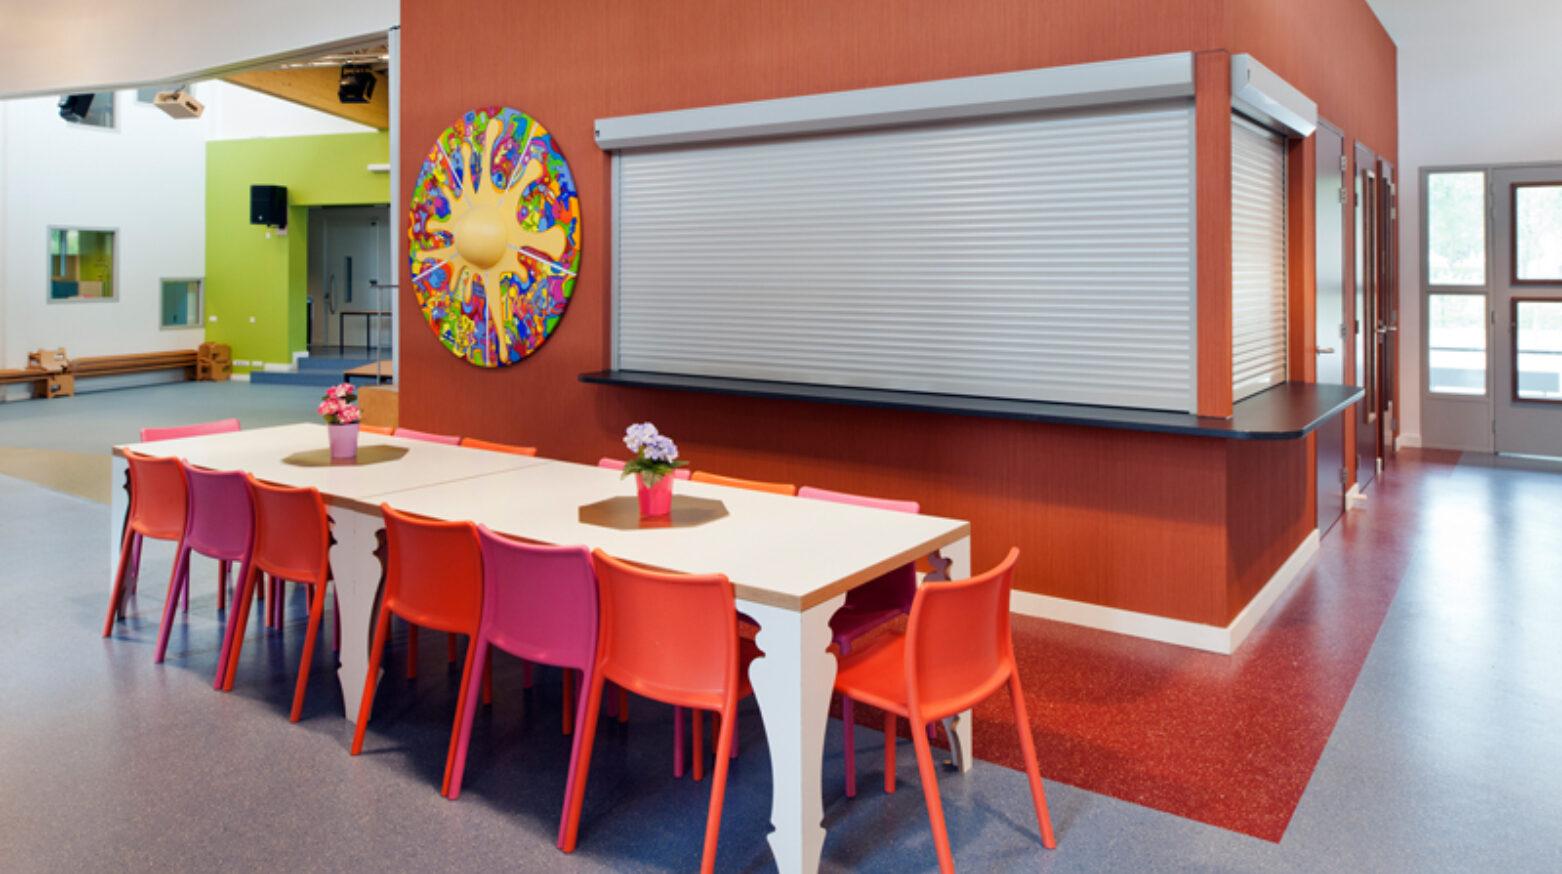 Kindcentrum oirschot tafel